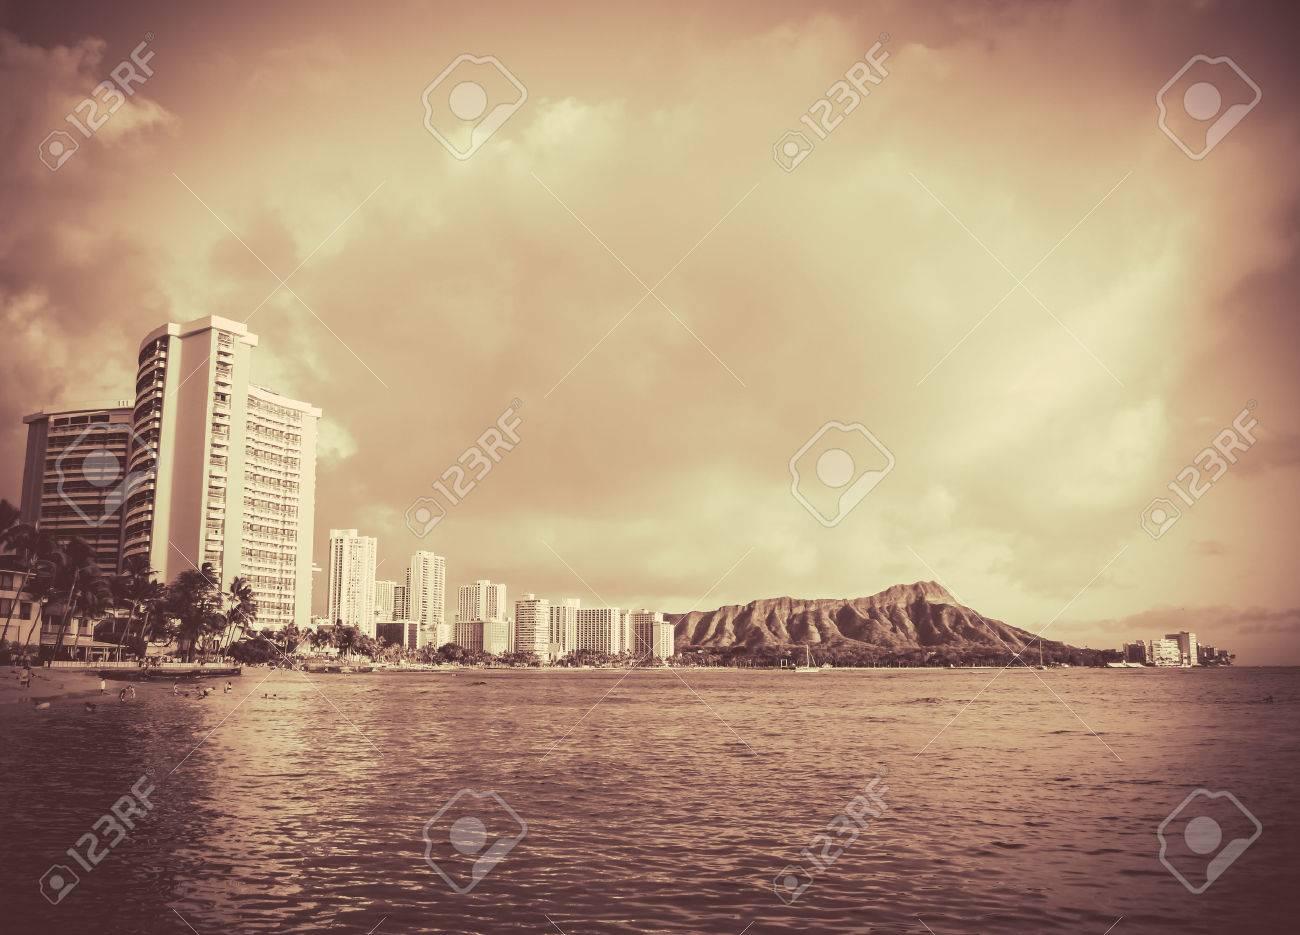 Retro vintage style black and white photo of waikiki beach hawaii stock photo 26730624